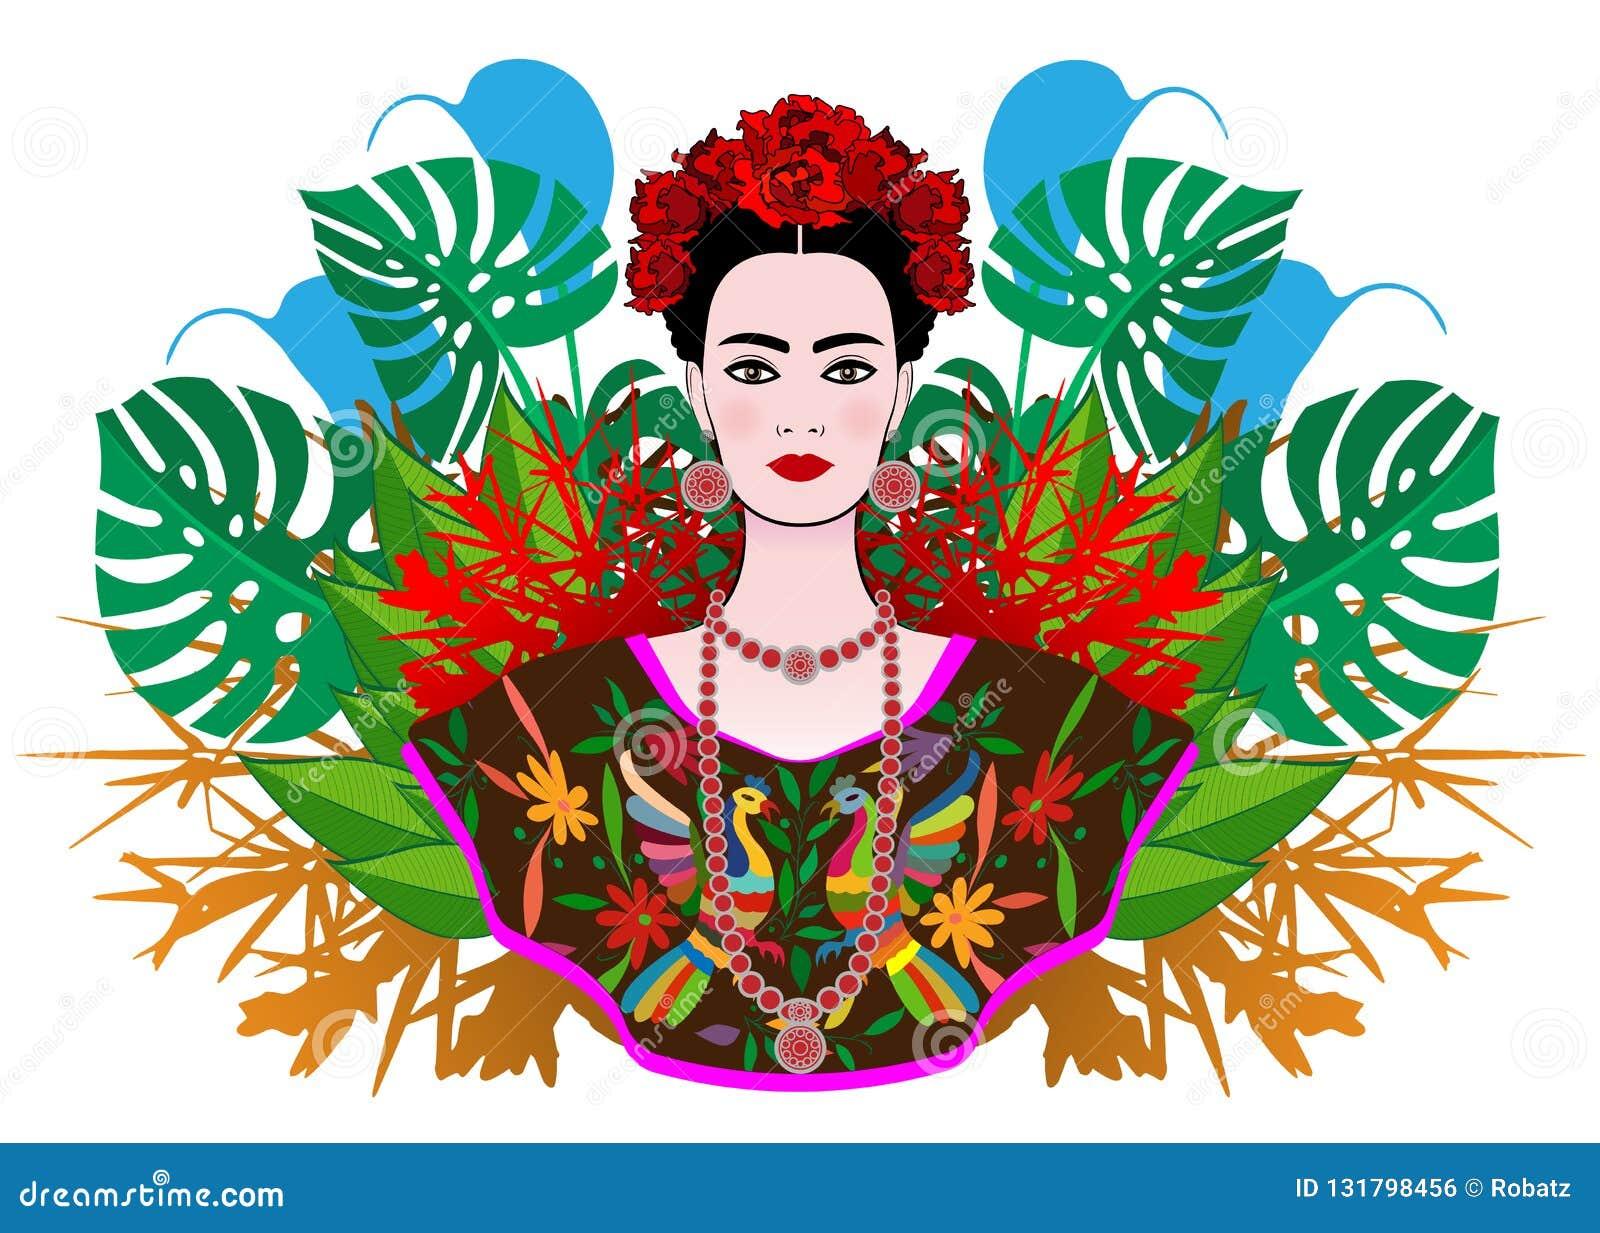 e8d37404d7 Retrato de la mujer mexicana hermosa joven con un peinado tradicional Joyas  mexicanas